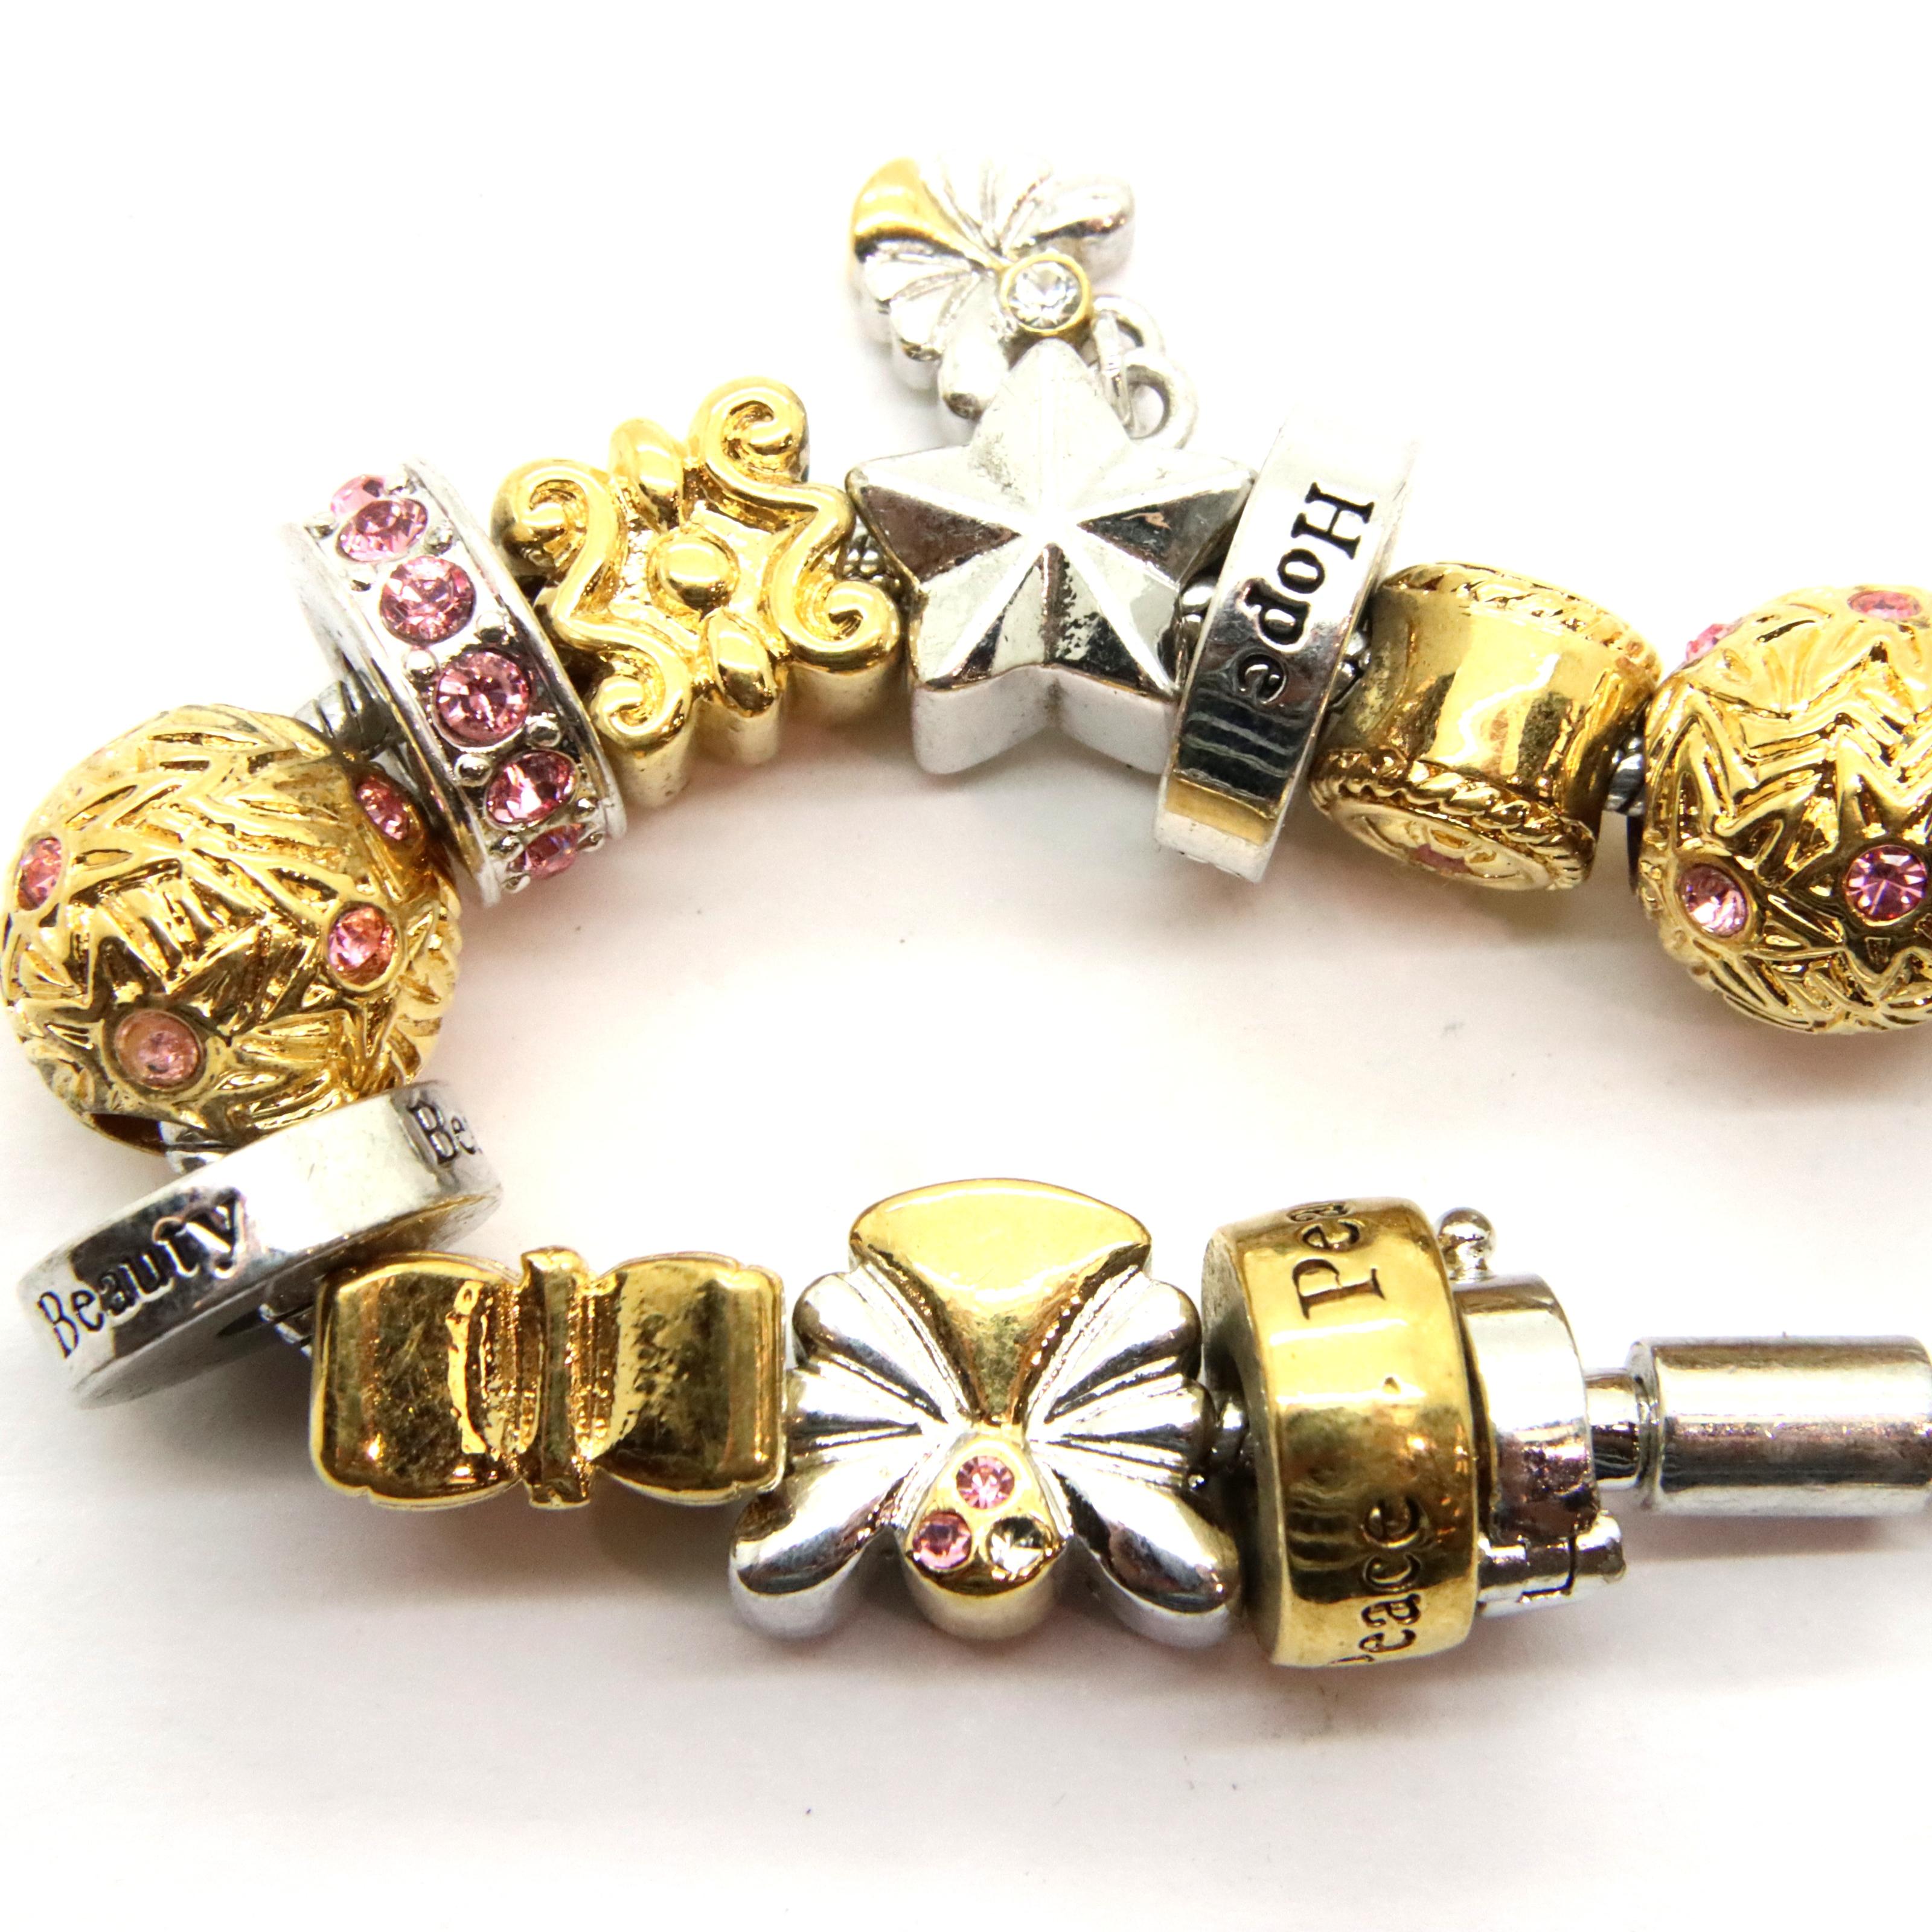 Bradford Exchange charm bracelet, L: 20 cm. P&P Group 1 (£14+VAT for the first lot and £1+VAT for